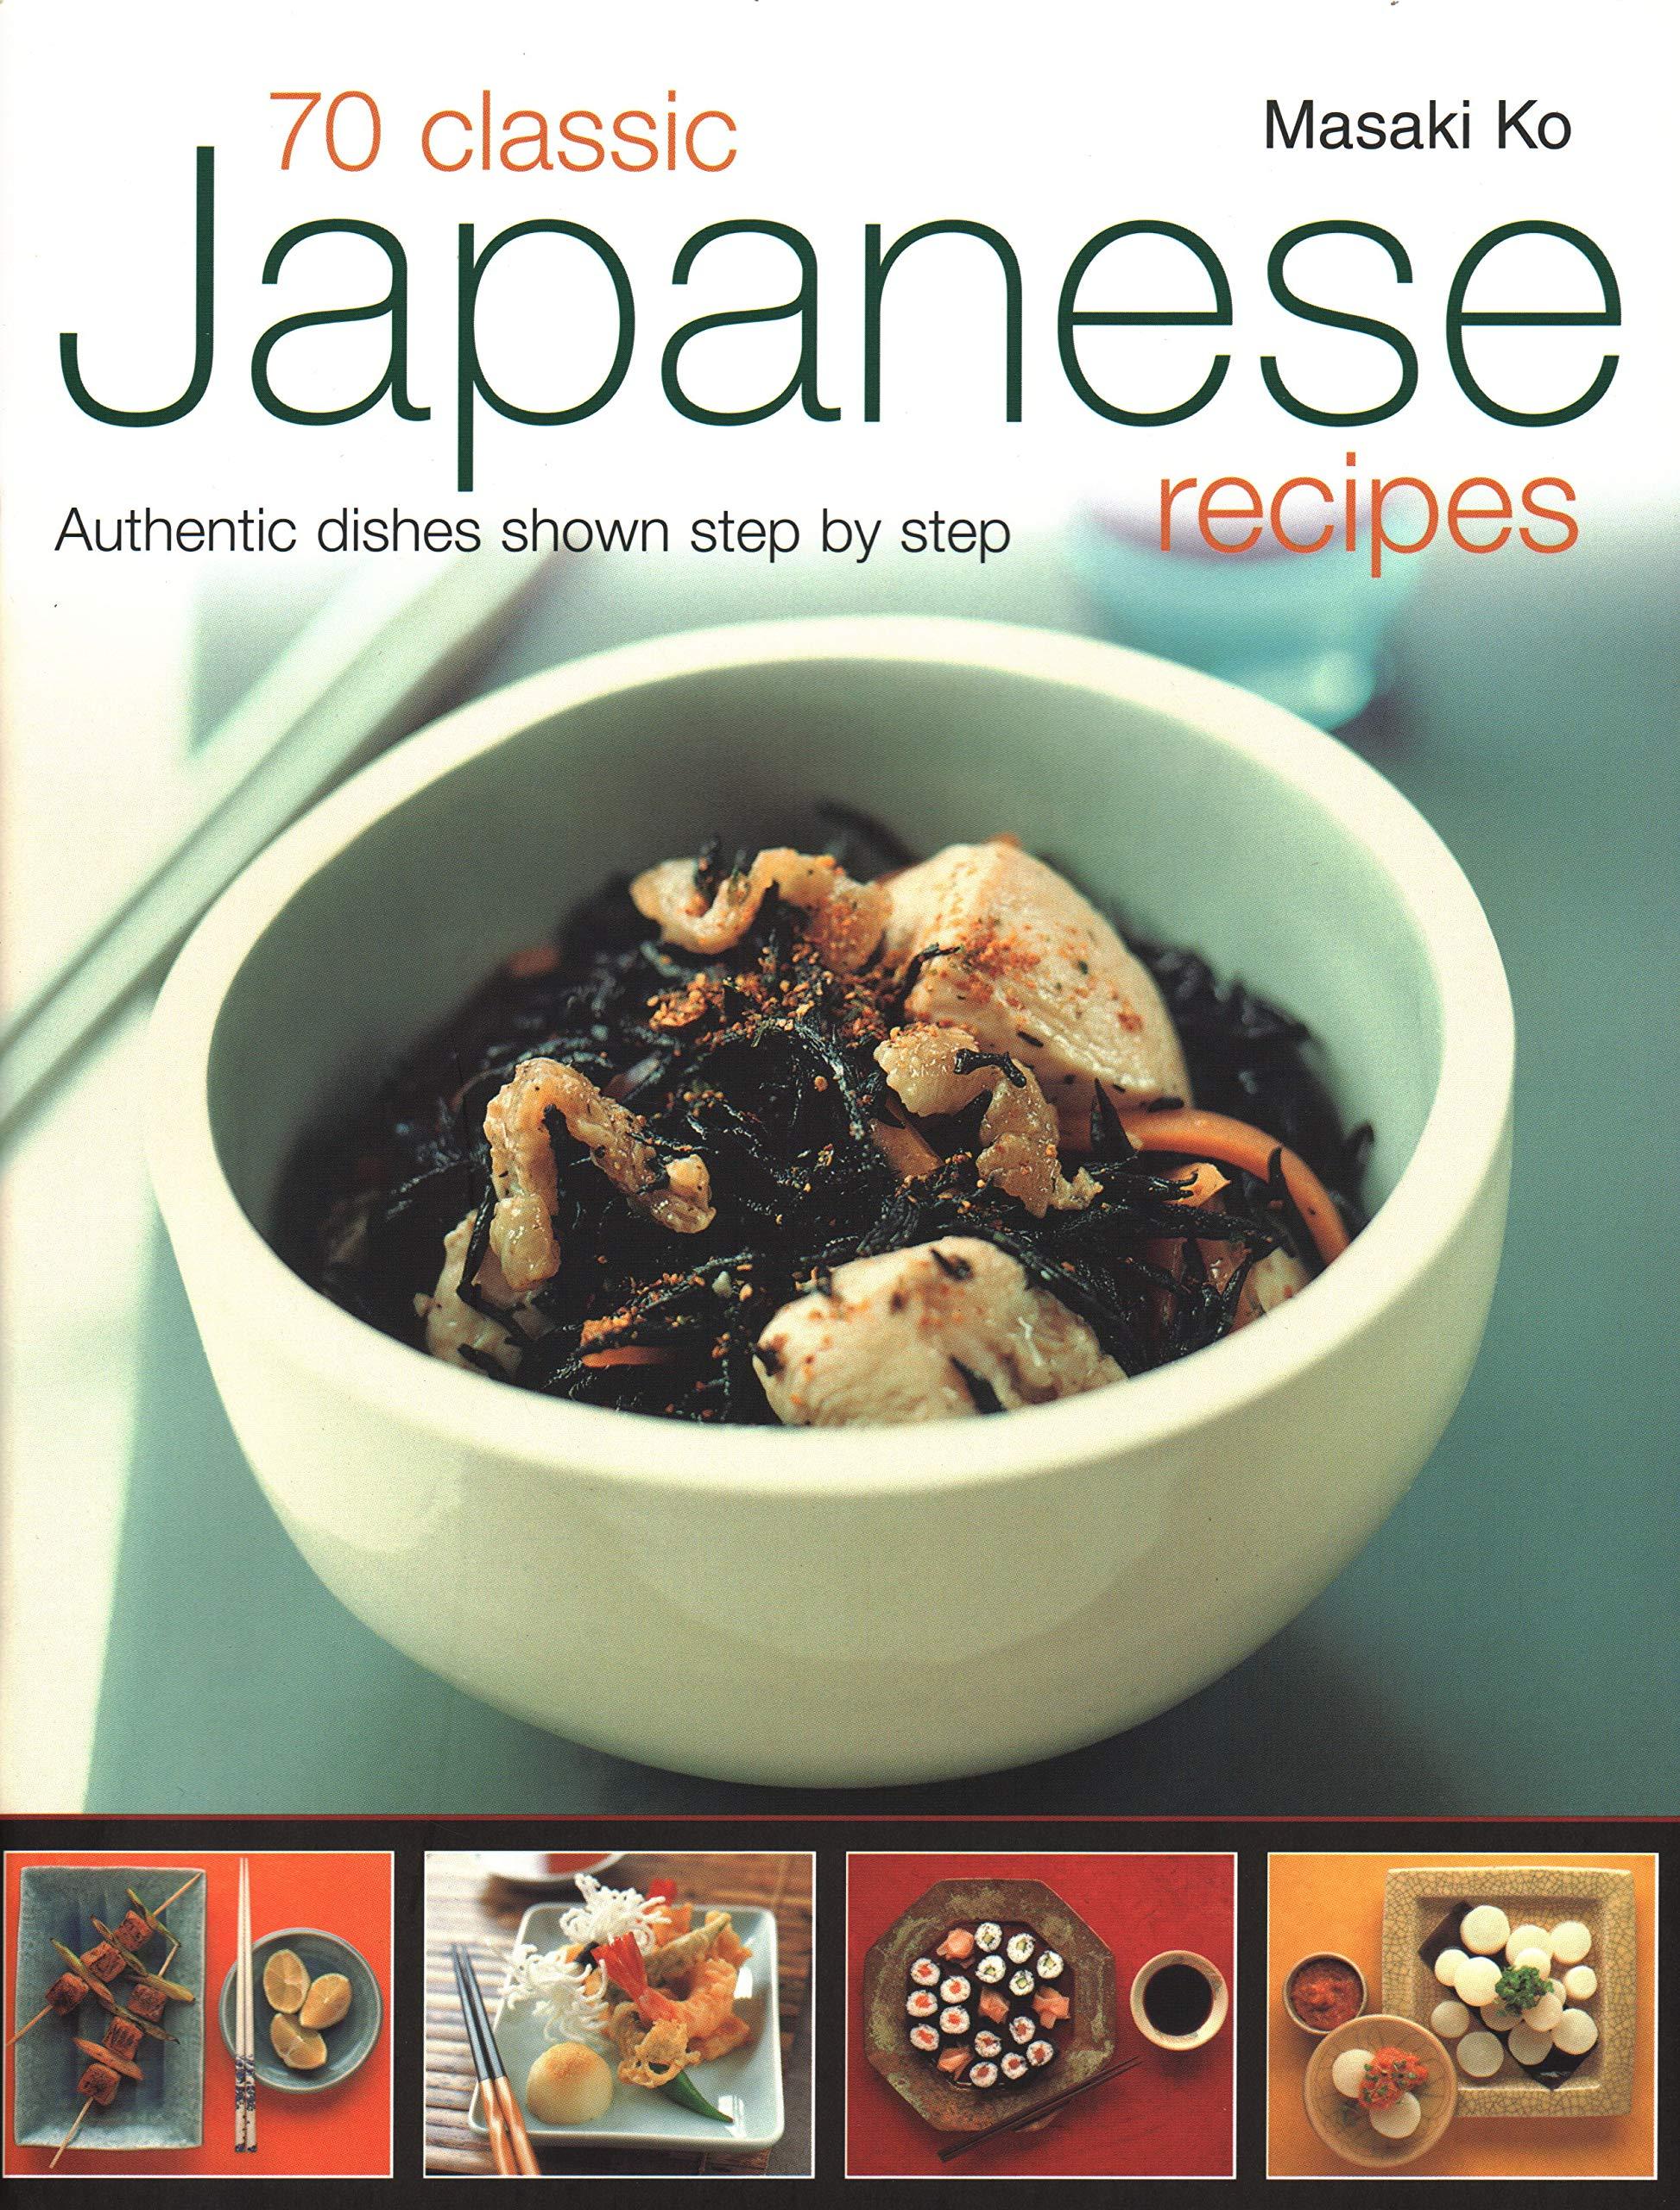 70 Classic Japanese Recipes Authentic Recipes Shown Step By Step Amazon Co Uk Masaki Ko 9781843093367 Books